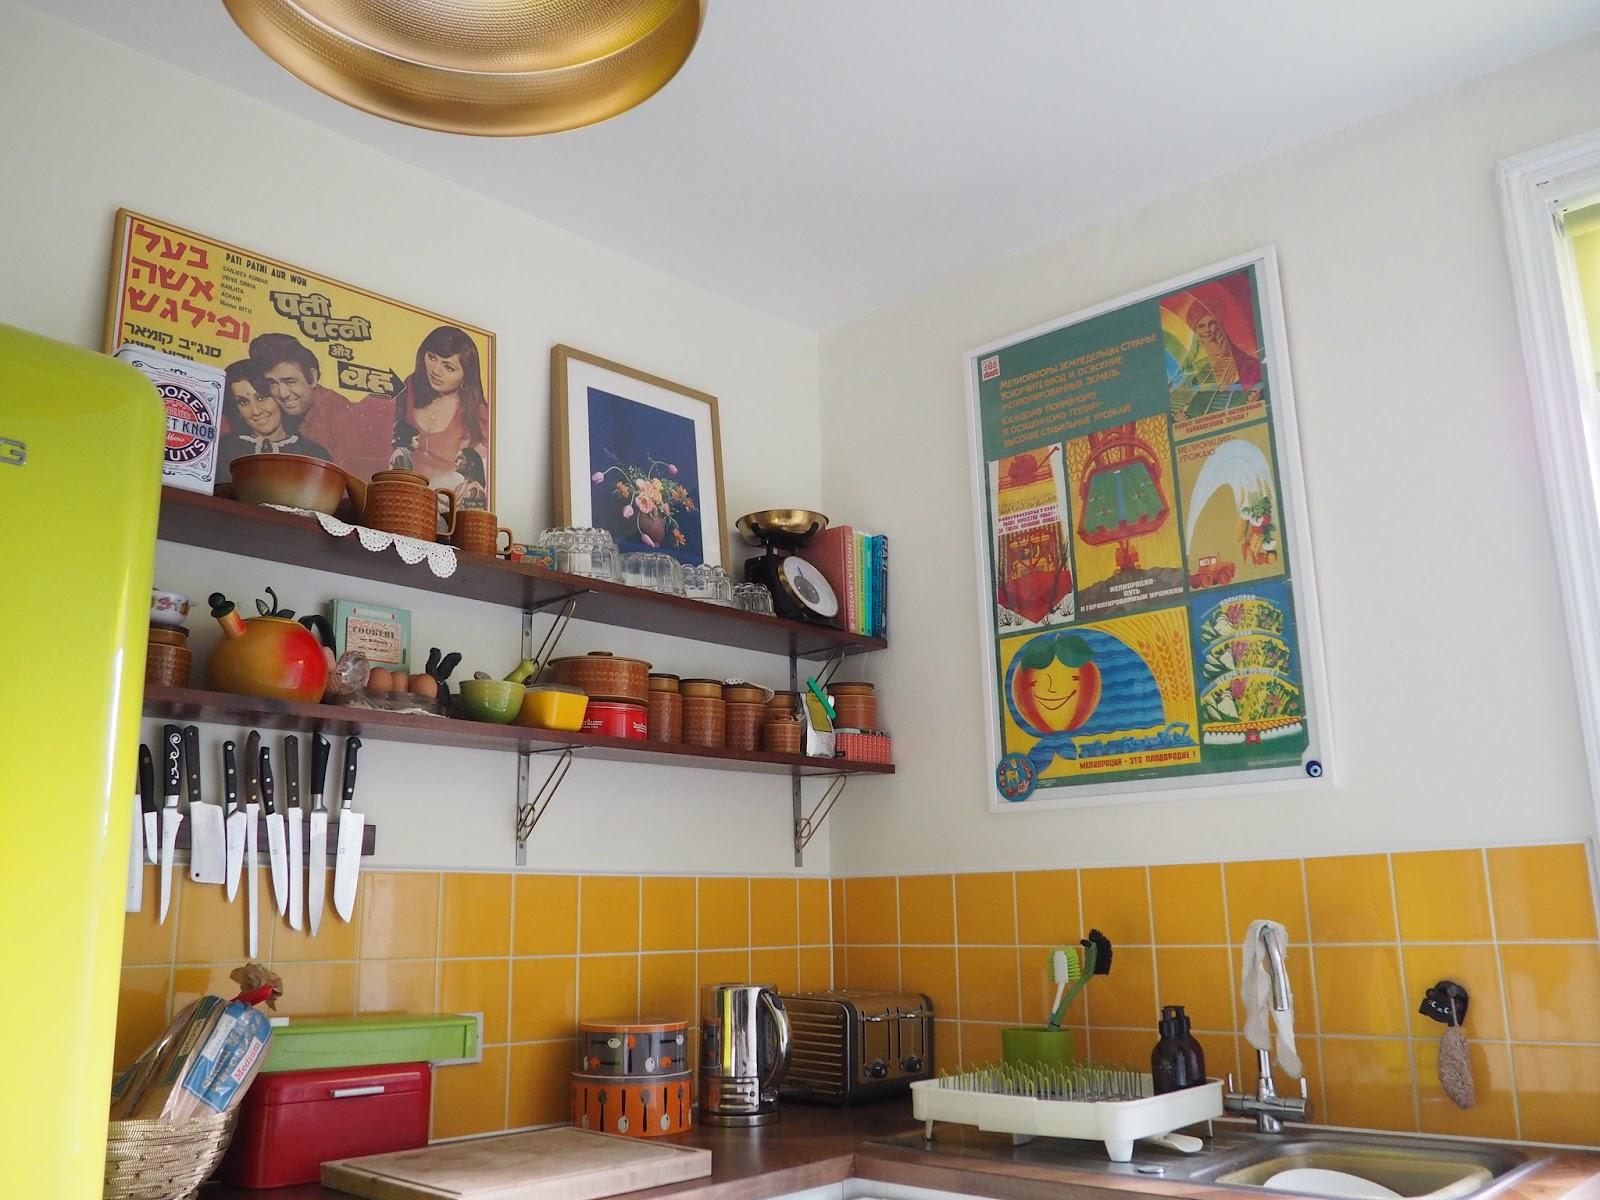 Kitchen shelving makeover